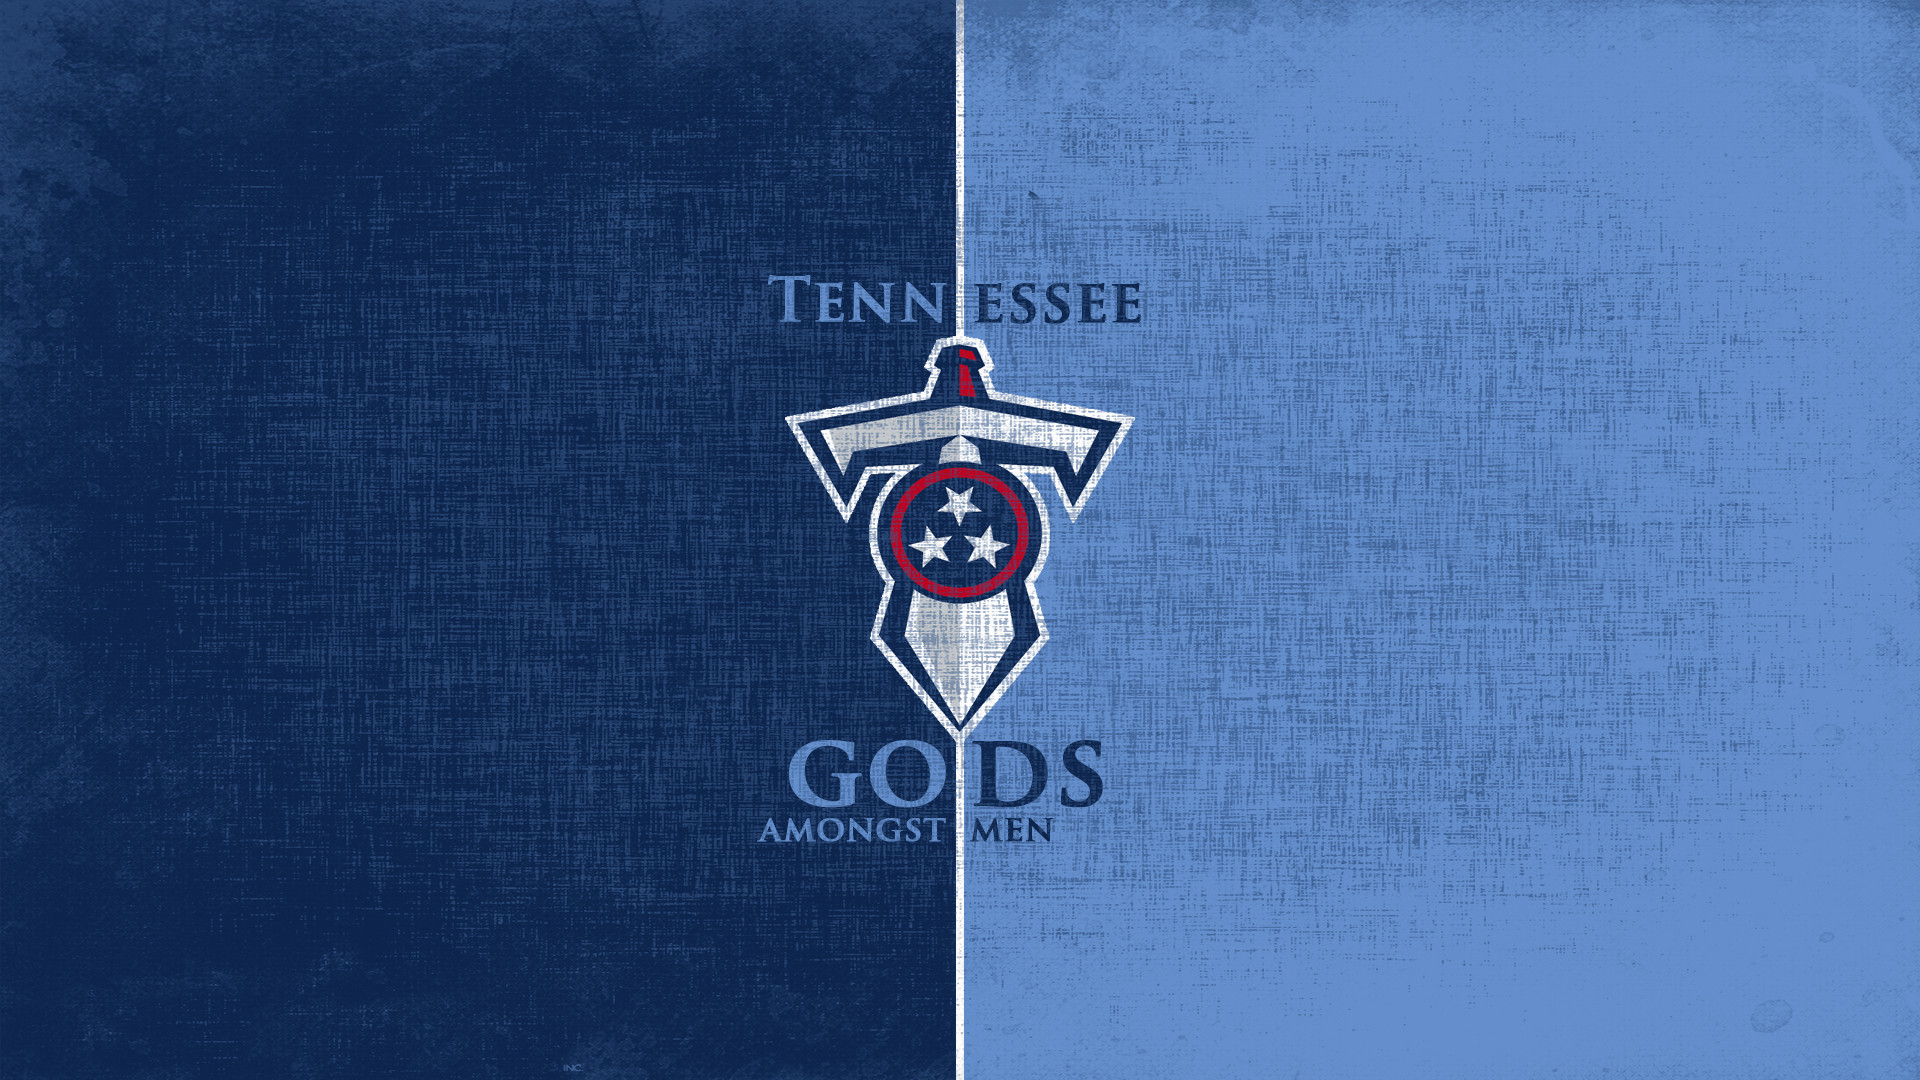 TENNESSEE TITANS nfl football dh wallpaper | | 158131 .